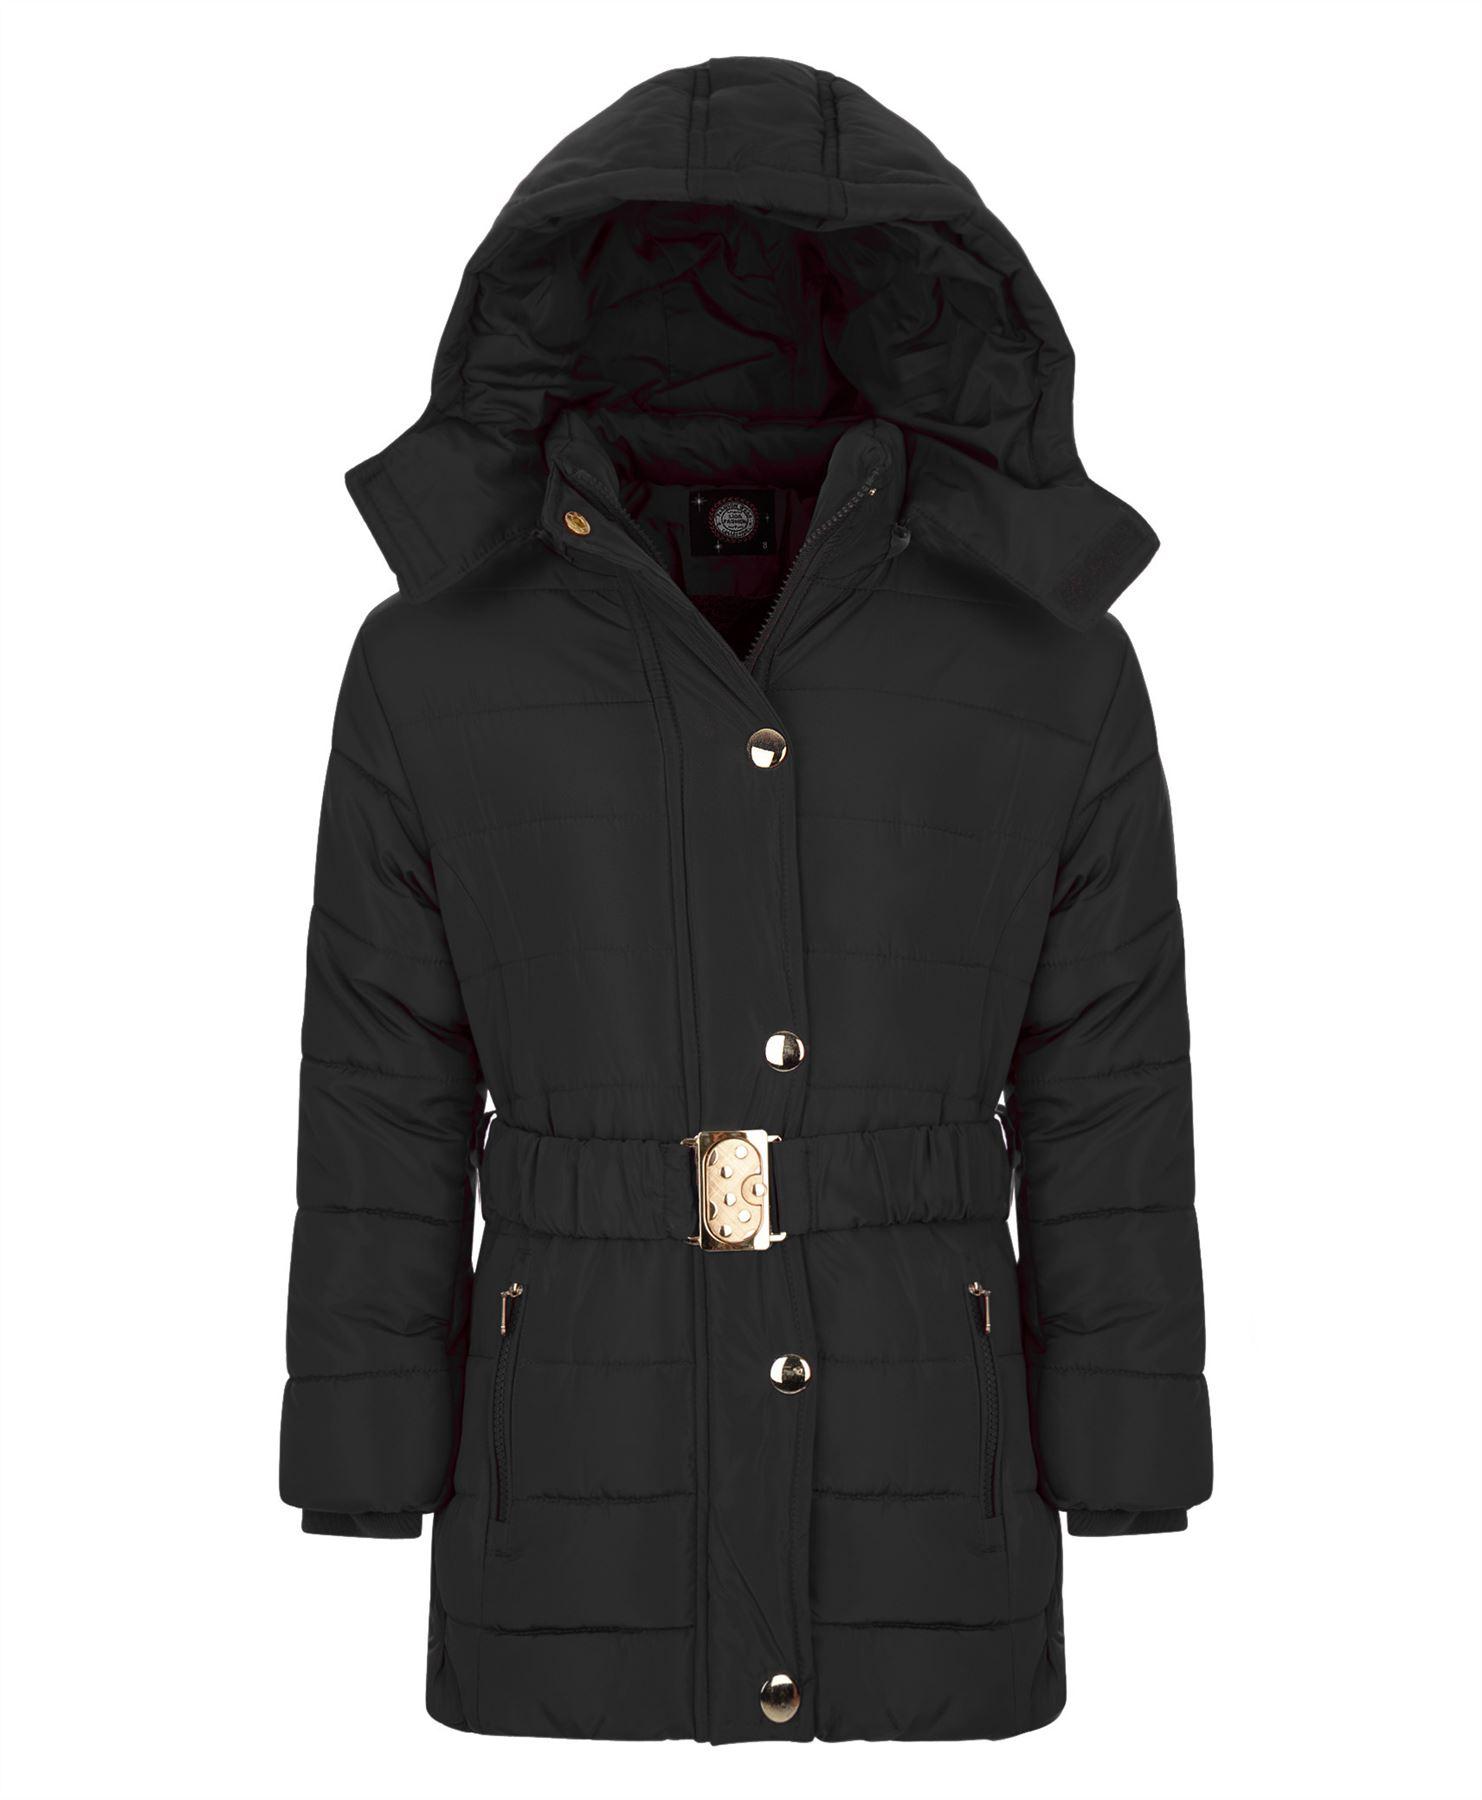 Girls Long Belted Winter Quilted Jacket Kids Detach Hood Padded ... : kids quilted jacket - Adamdwight.com